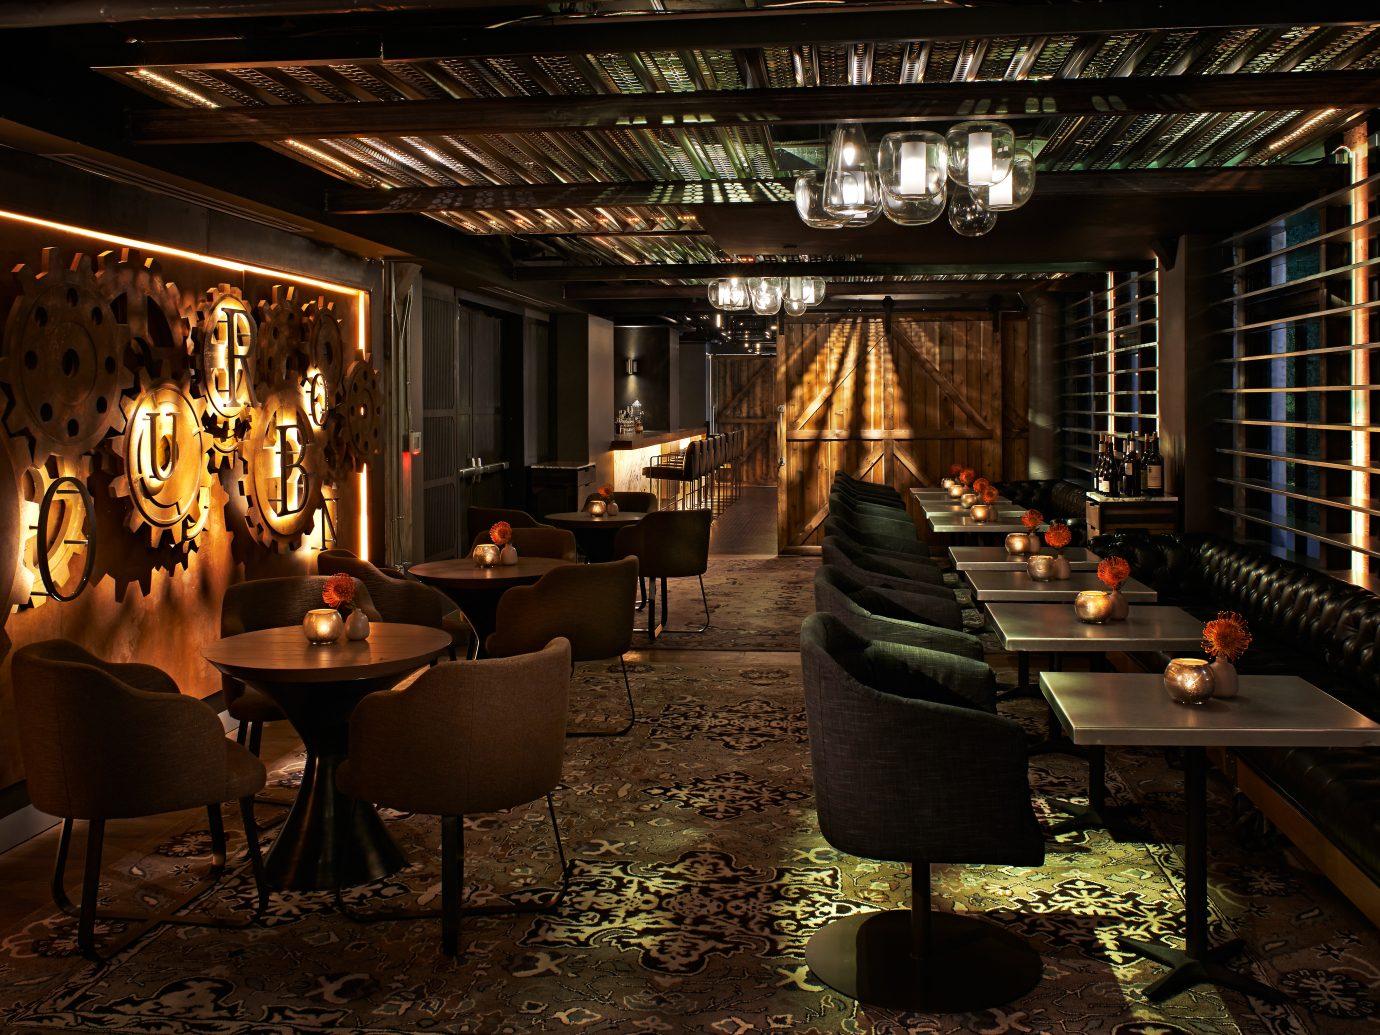 Bar Beach Boutique Dining Drink Eat indoor floor room ceiling lighting interior design restaurant Lobby furniture several